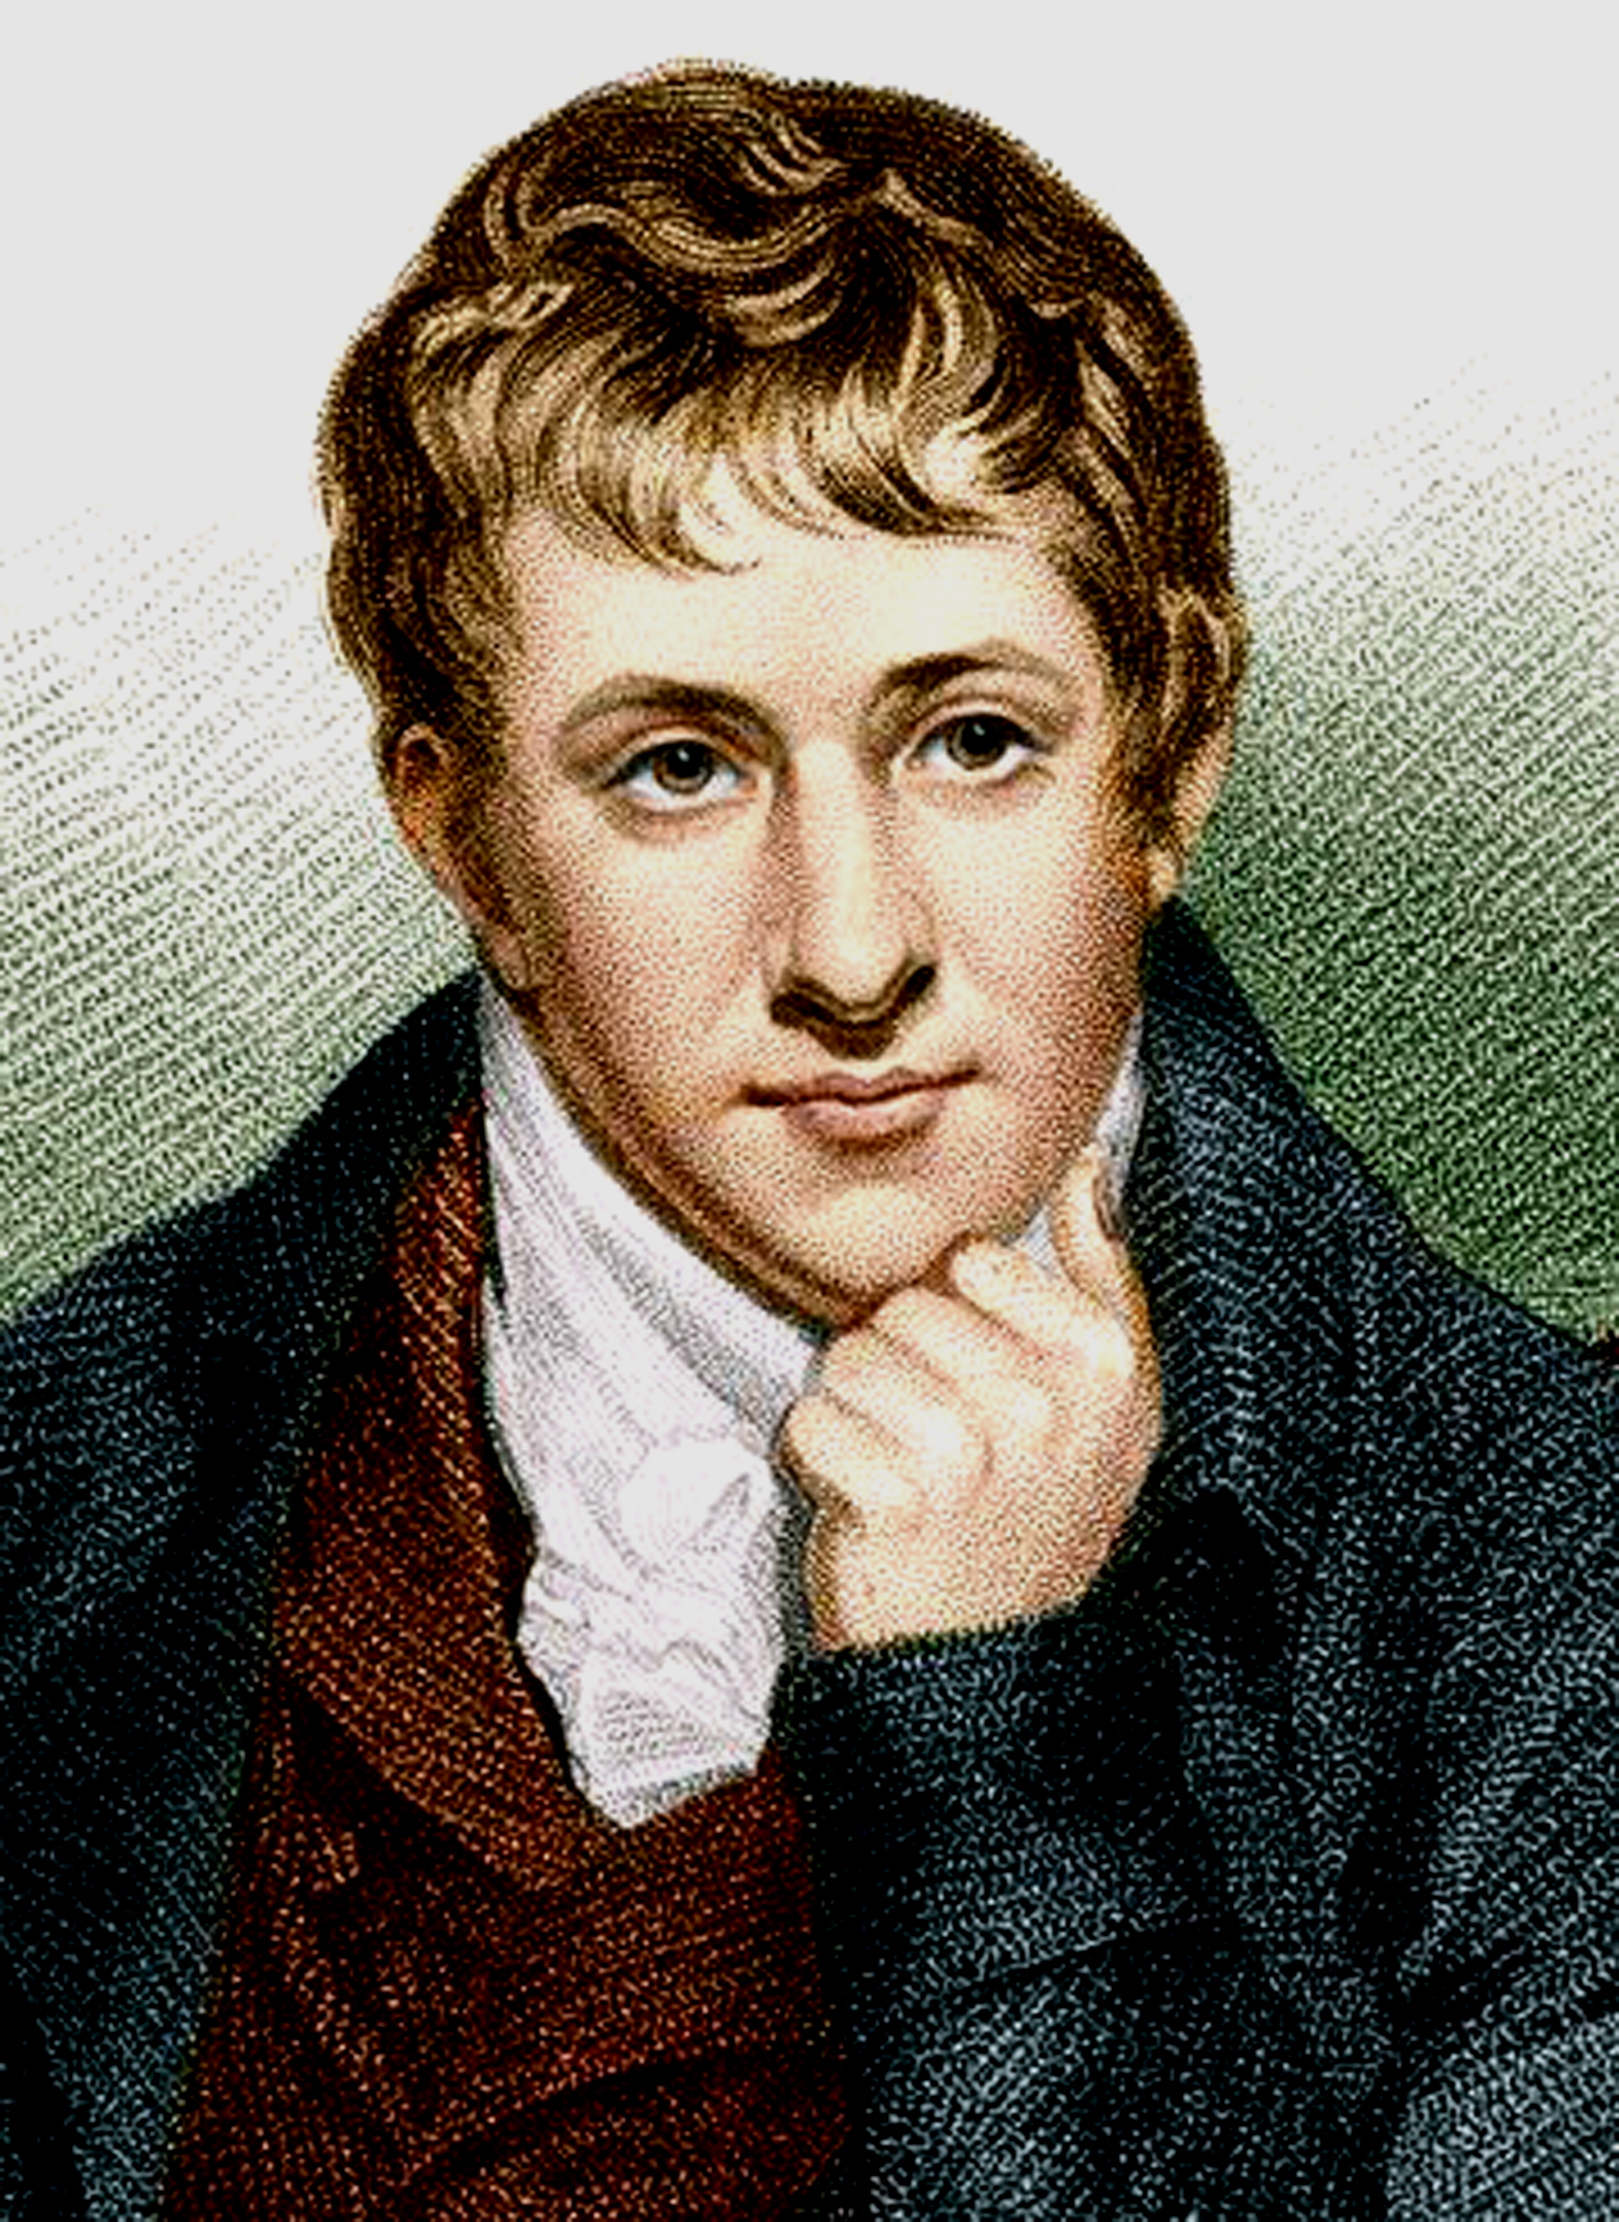 Humphry Davy, English chemist